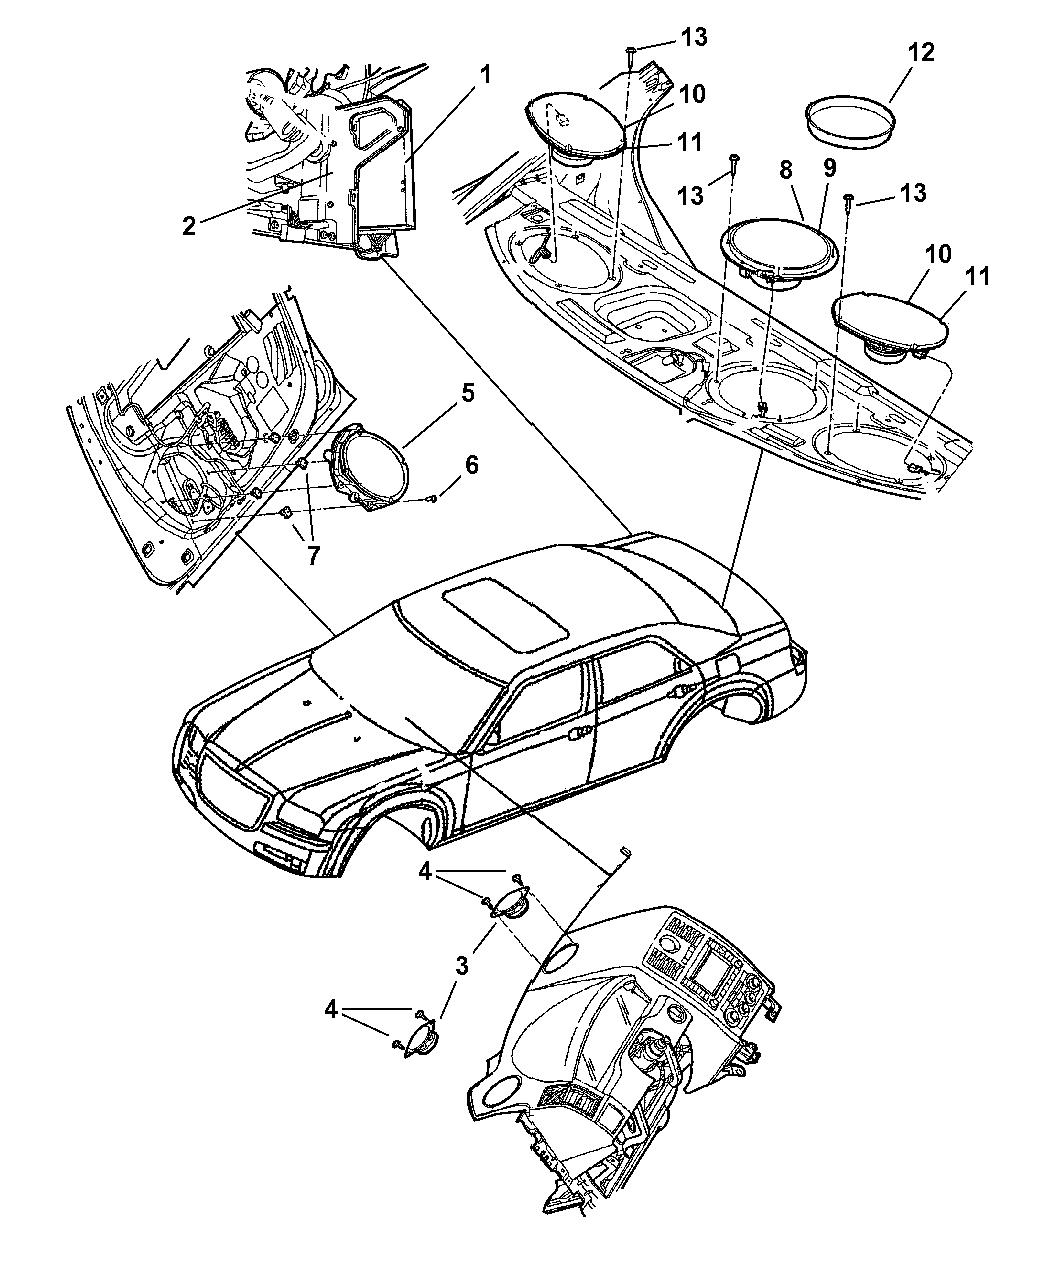 Dodge Charger Engine Diagram Dodge Charger